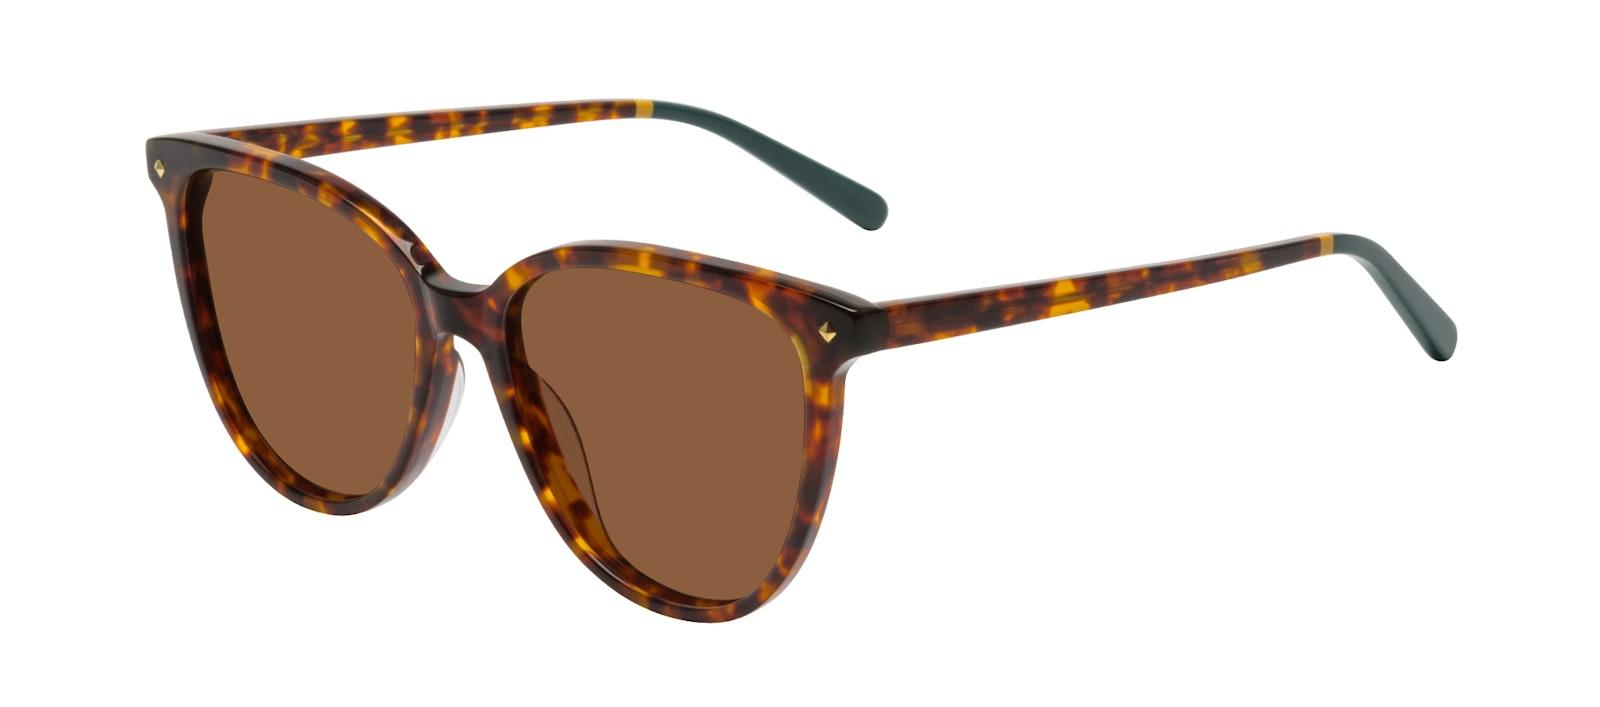 Affordable Fashion Glasses Sunglasses Women Jane Tortoise Tilt